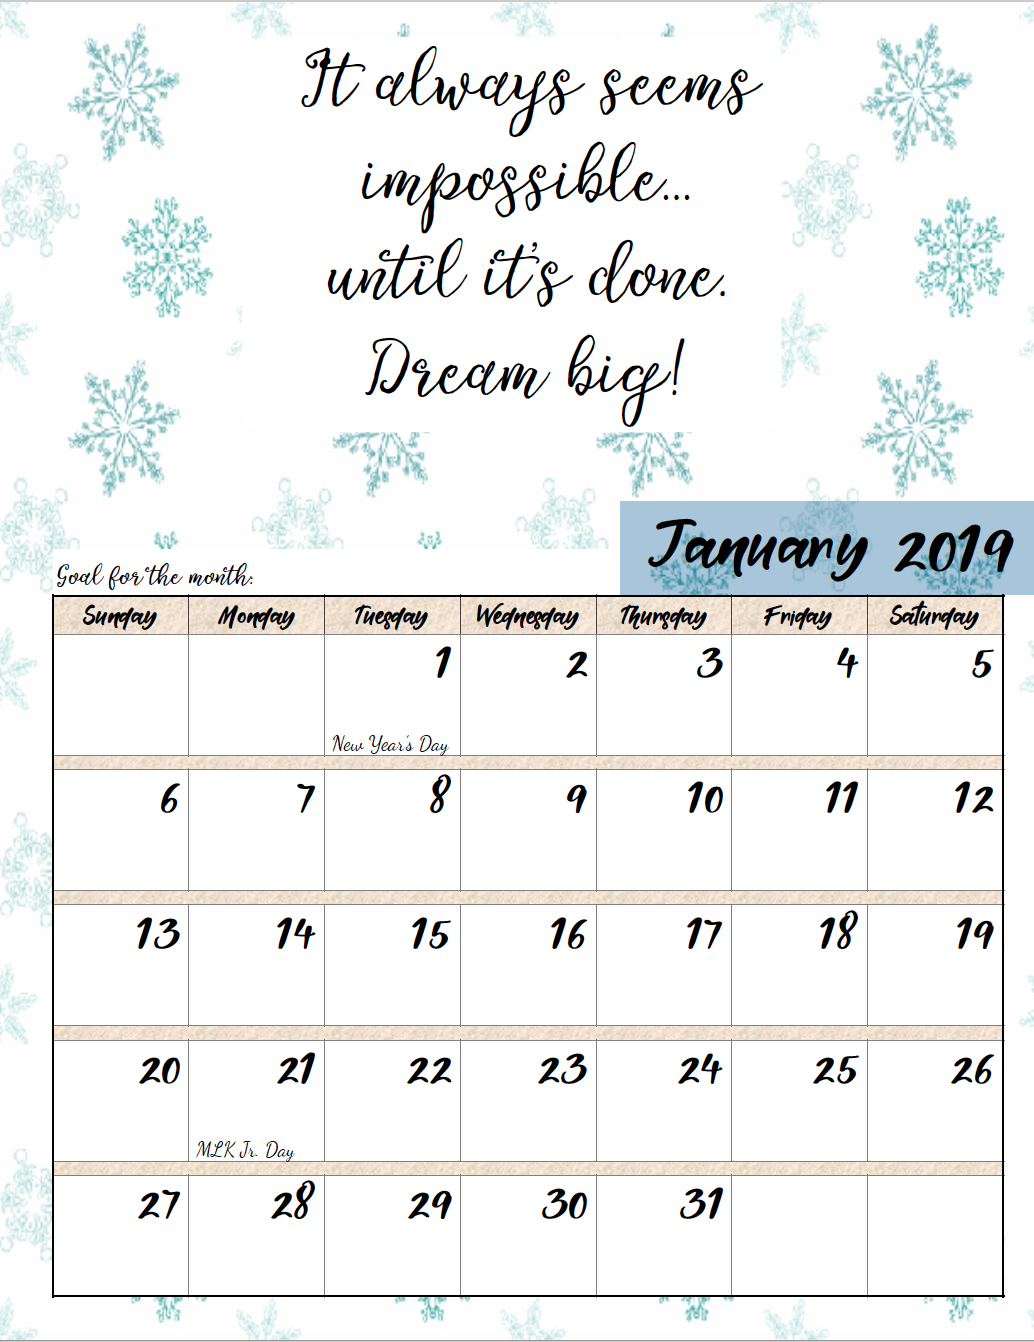 Free Printable 2019 Monthly Motivational Calendars | Morning Prayers M&m Calendar 2019